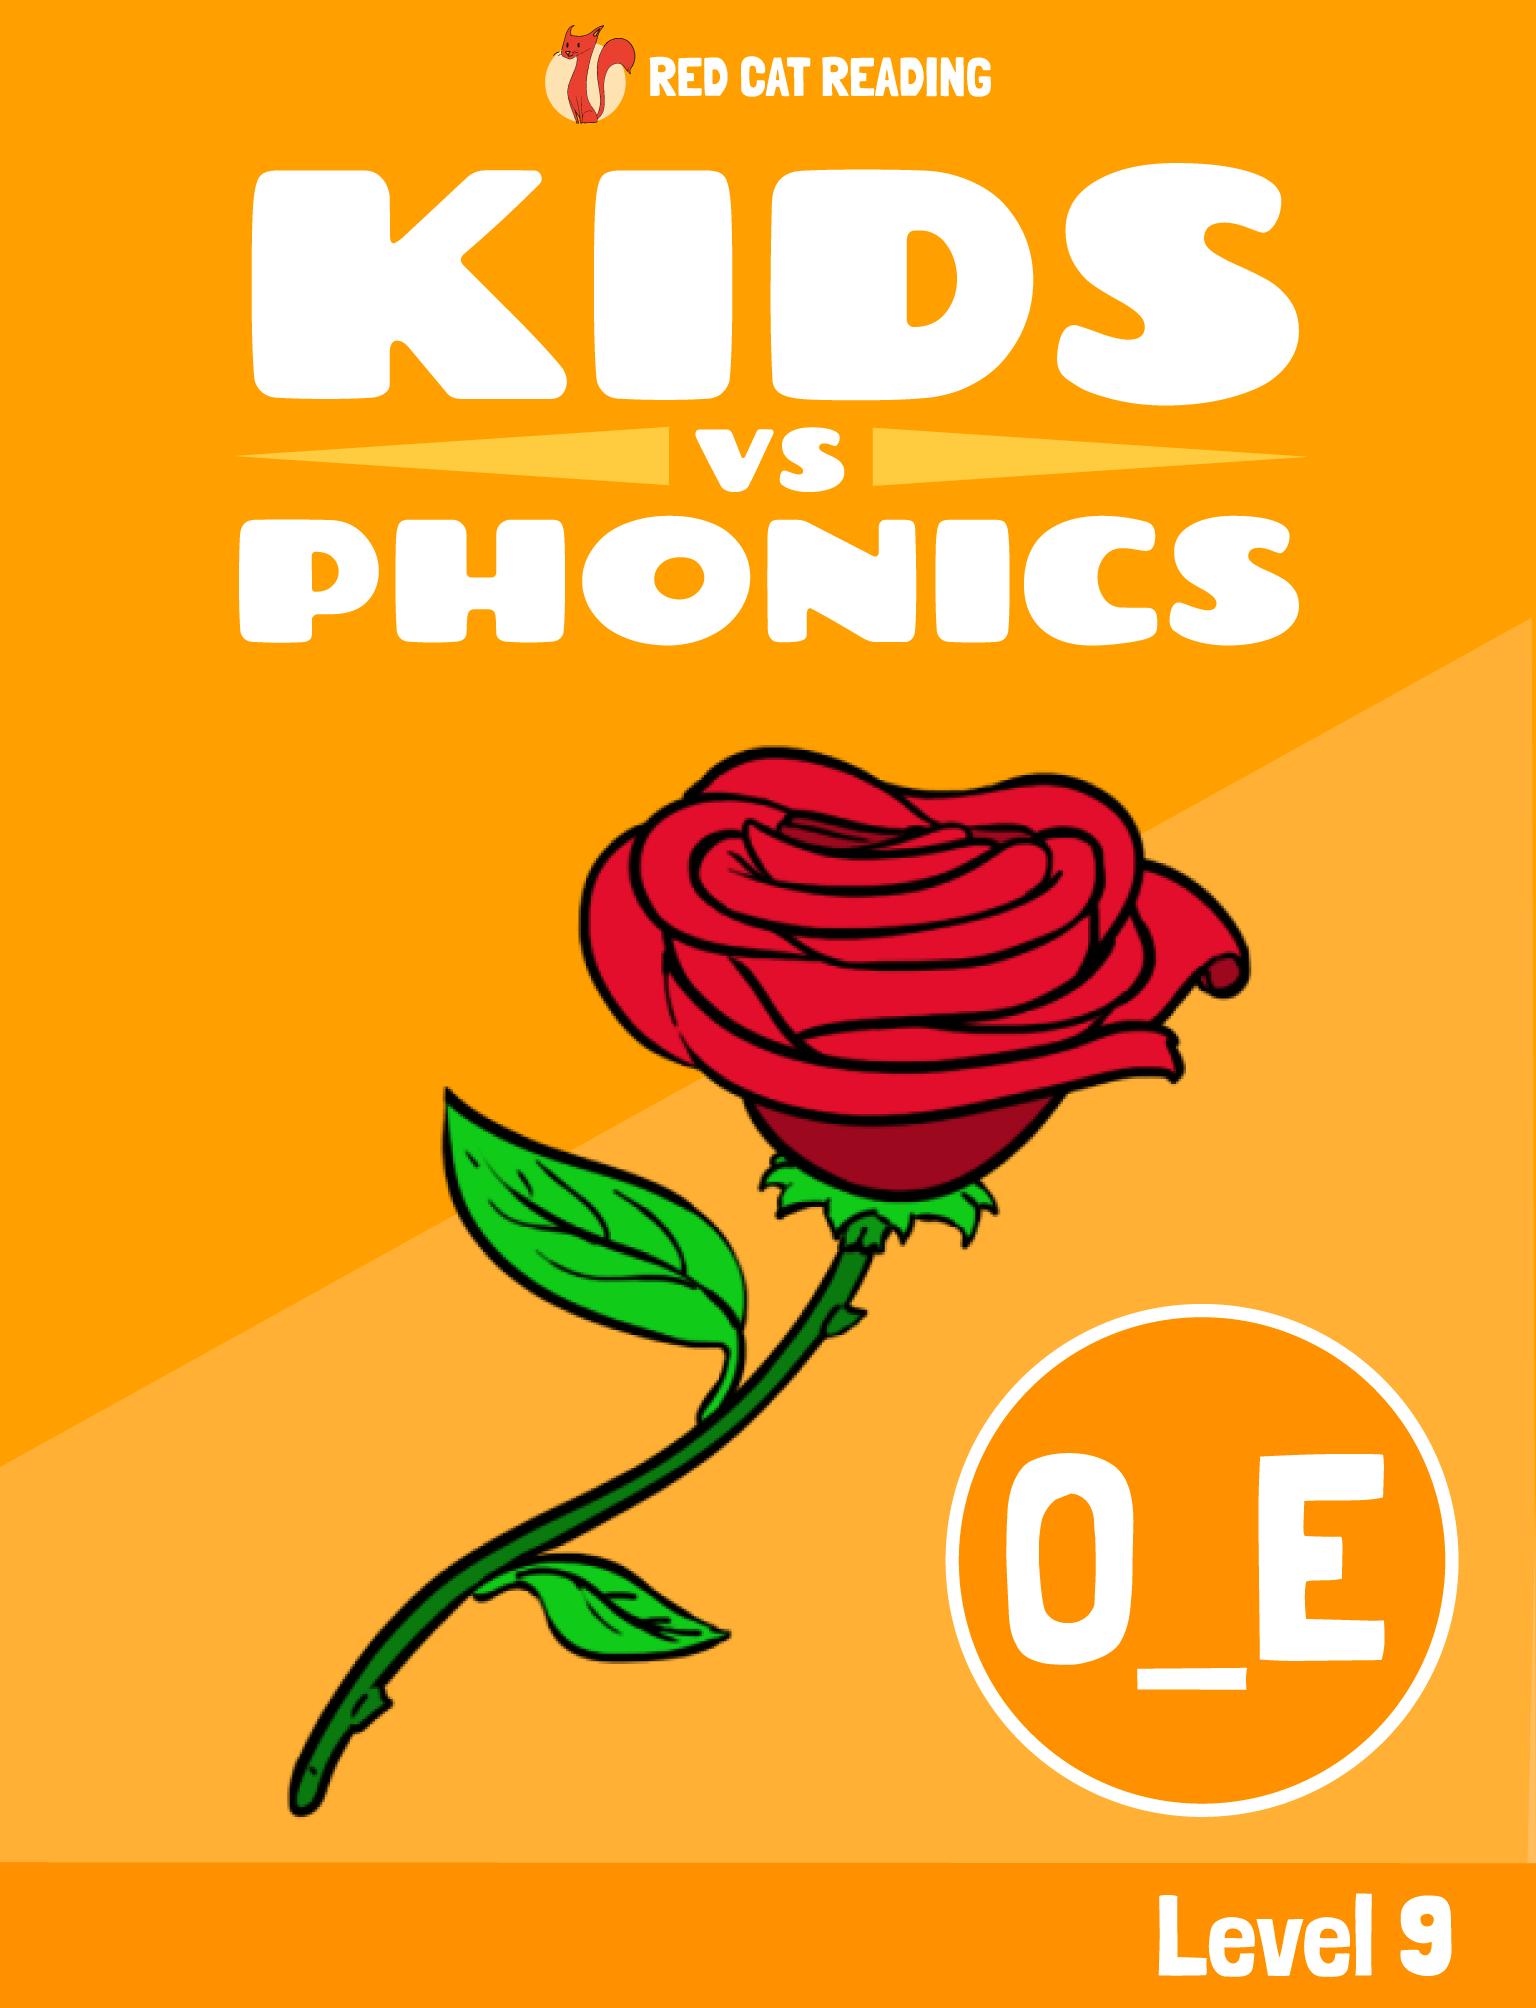 Red Cat Reading Kids vs Phonics Phonics Sound O_E Kids Learn to Read